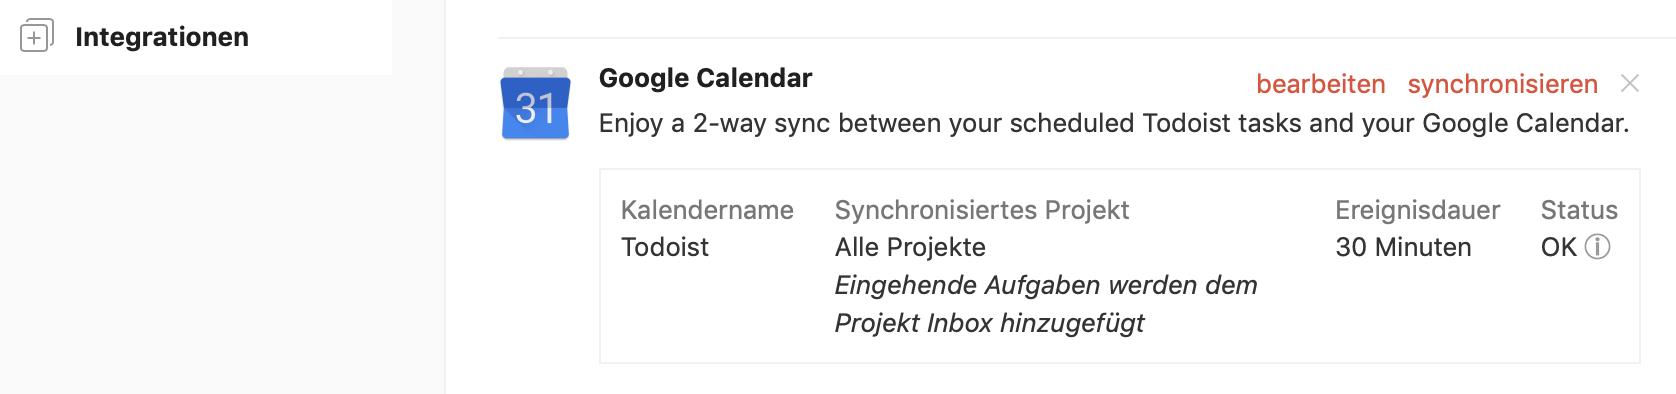 TD-Sync mit Google Kalender